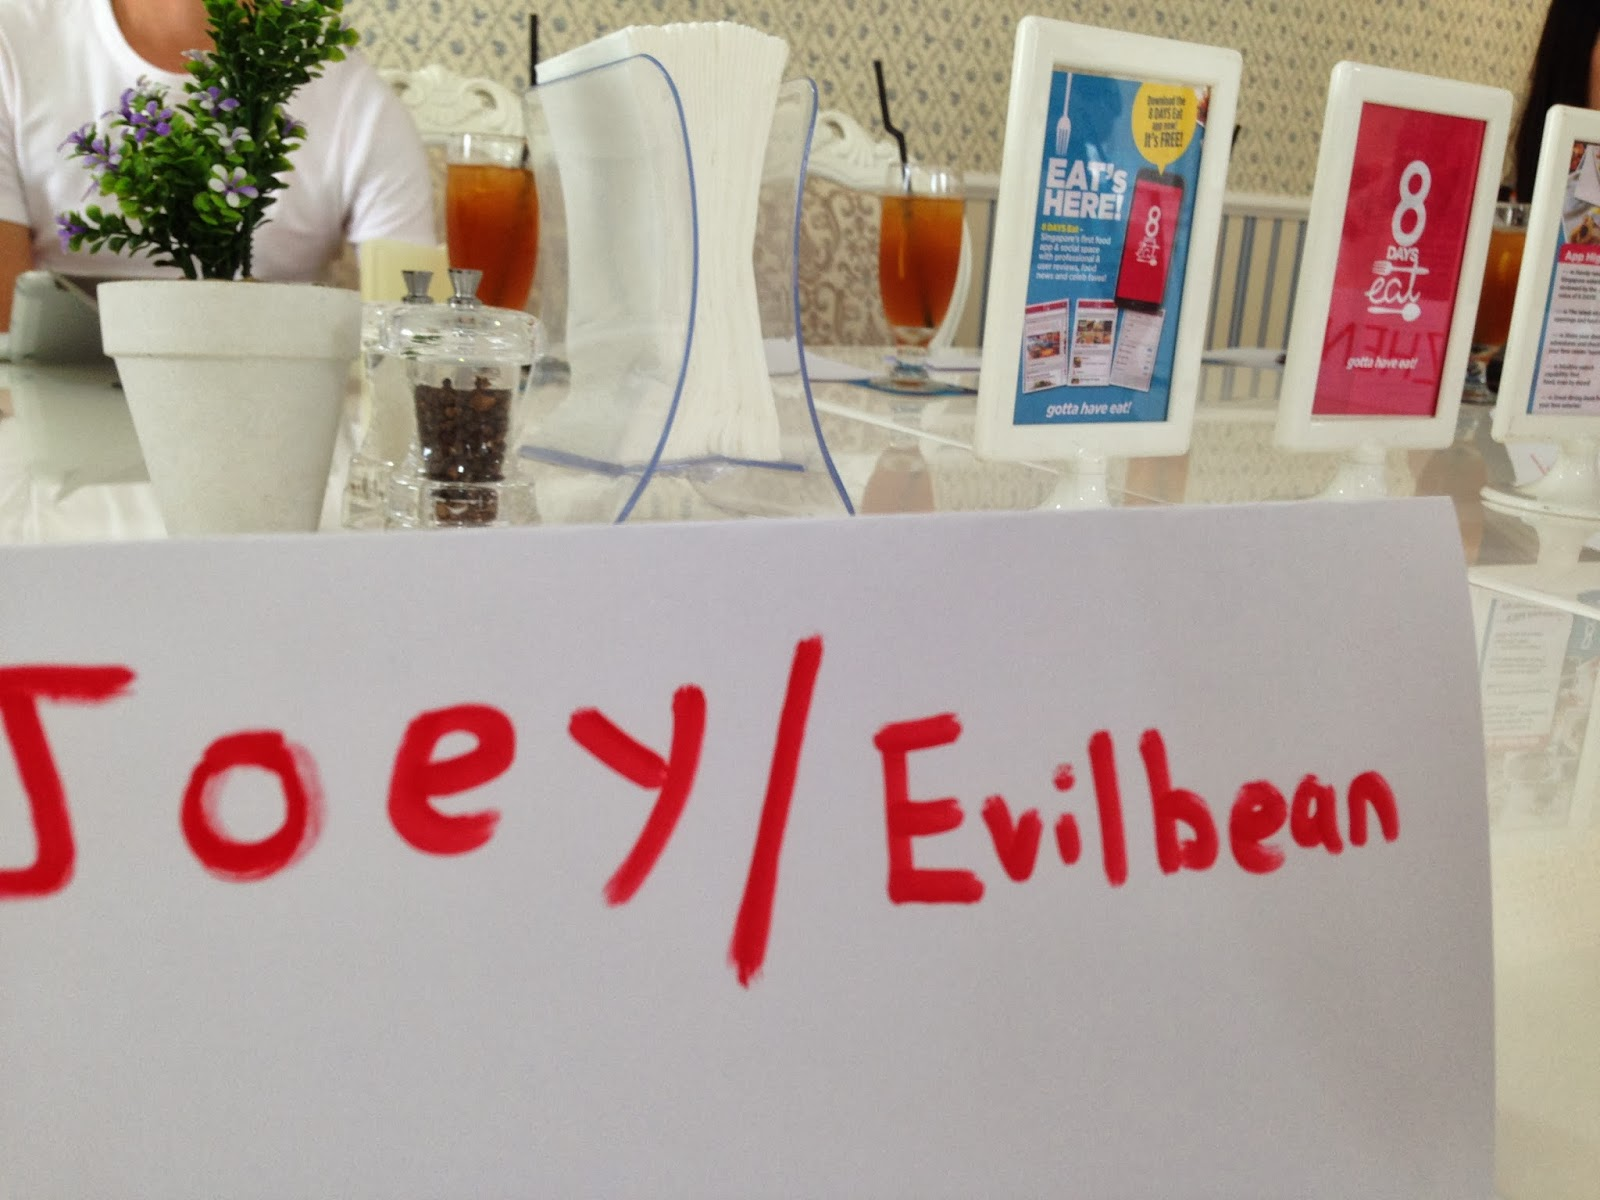 Evilbean @ 8 Days Eat